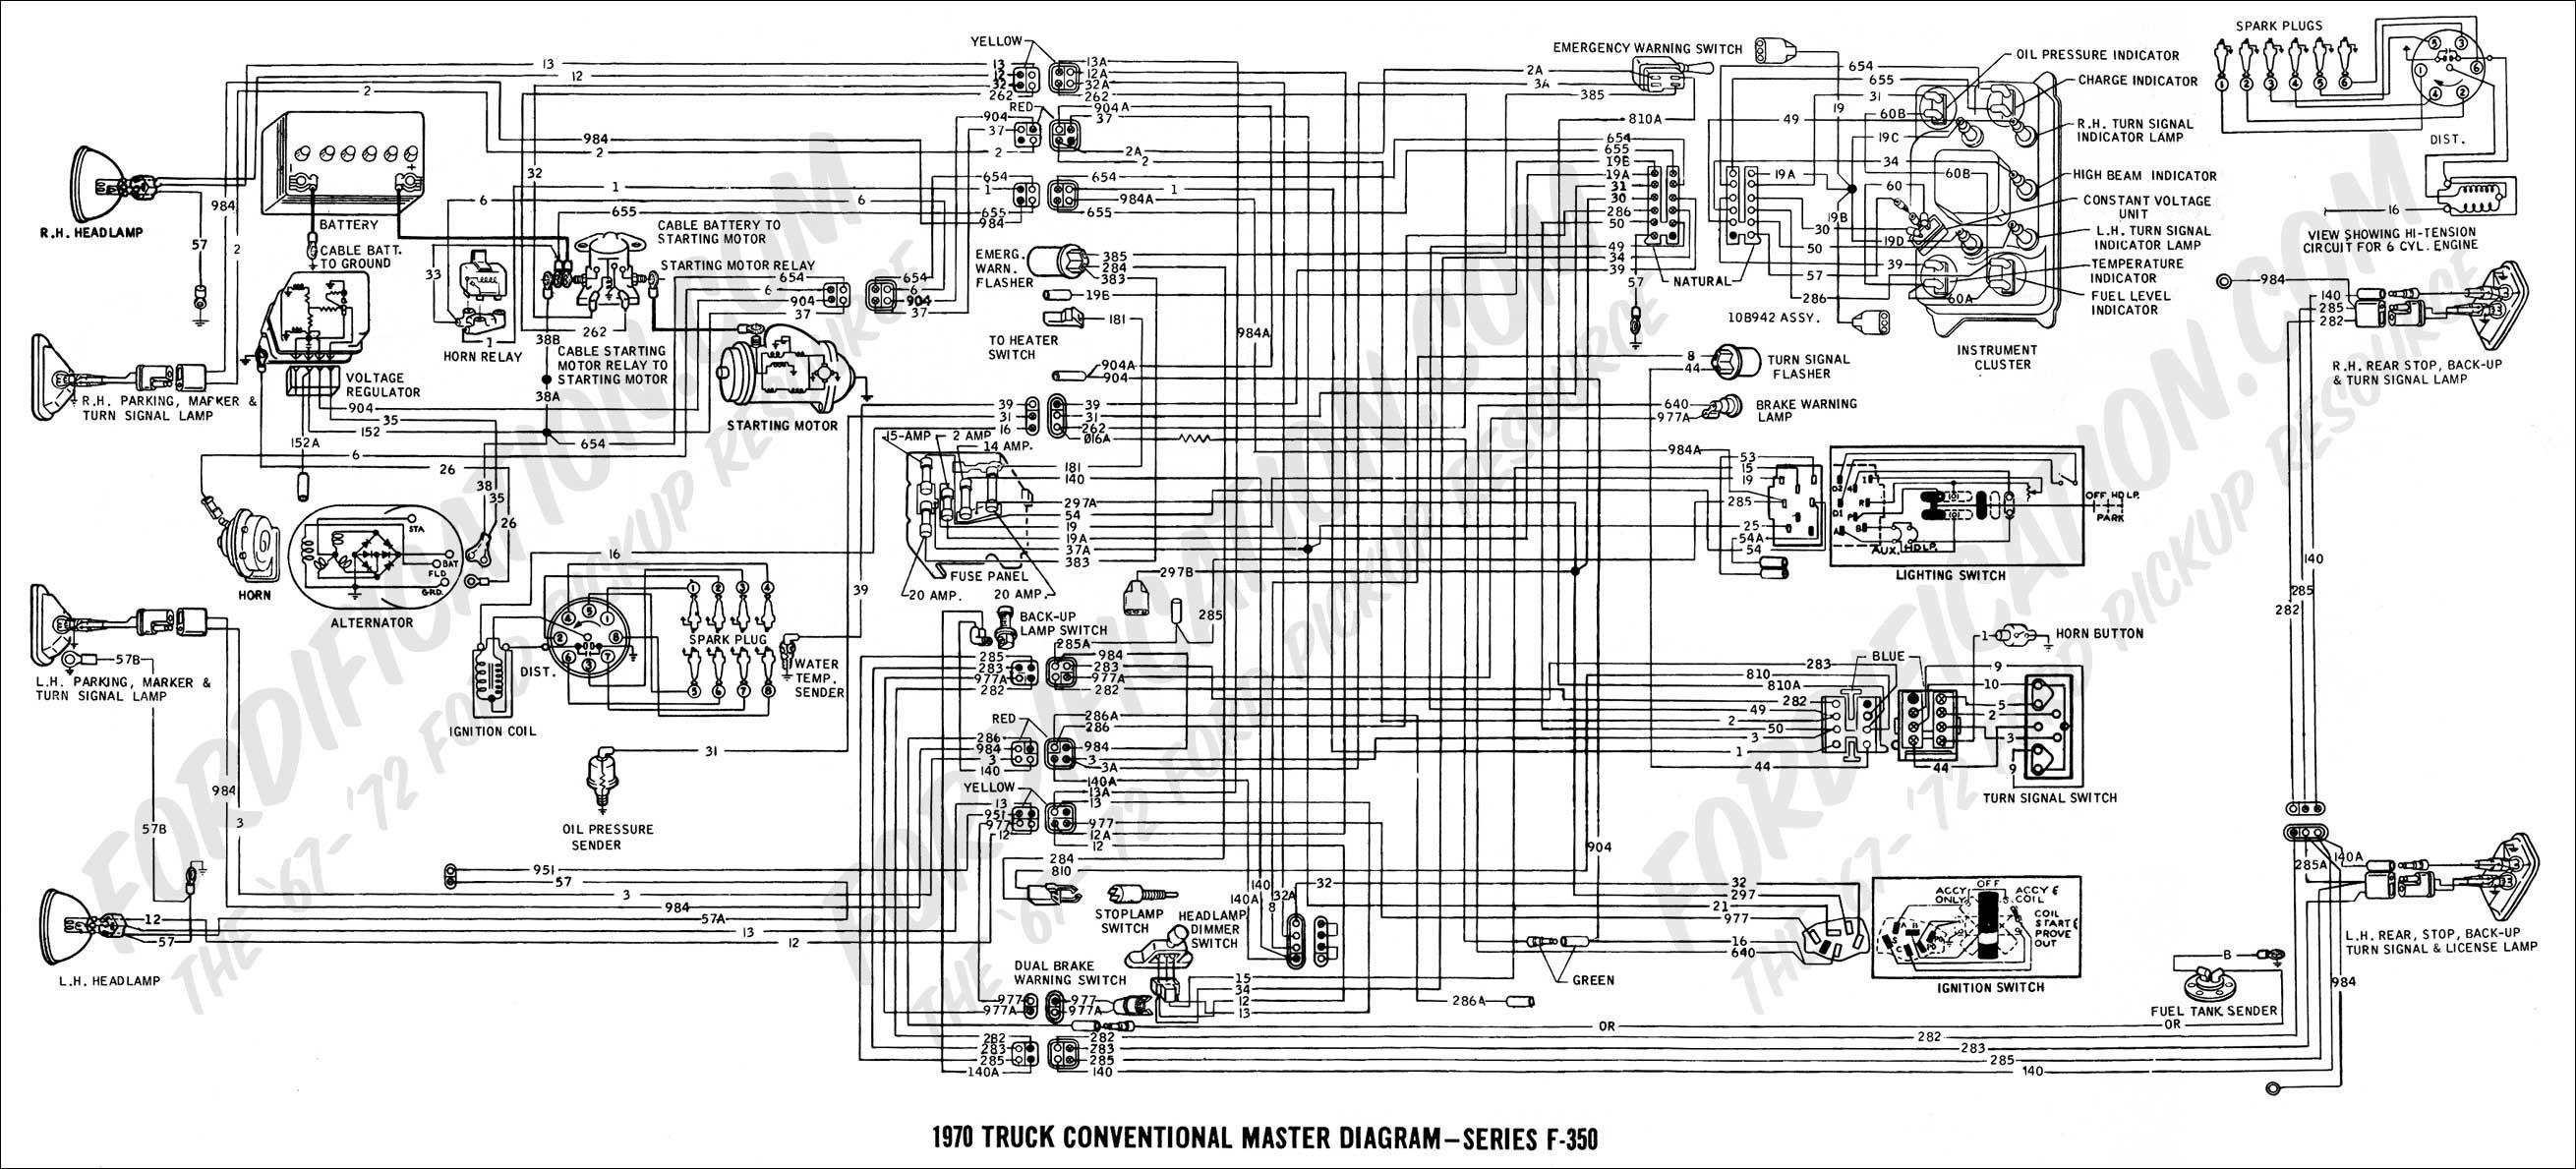 12v Starter solenoid Wiring Diagram New Wiring Diagram ford F350 Wiring Diagram 2013 F350 Wiring